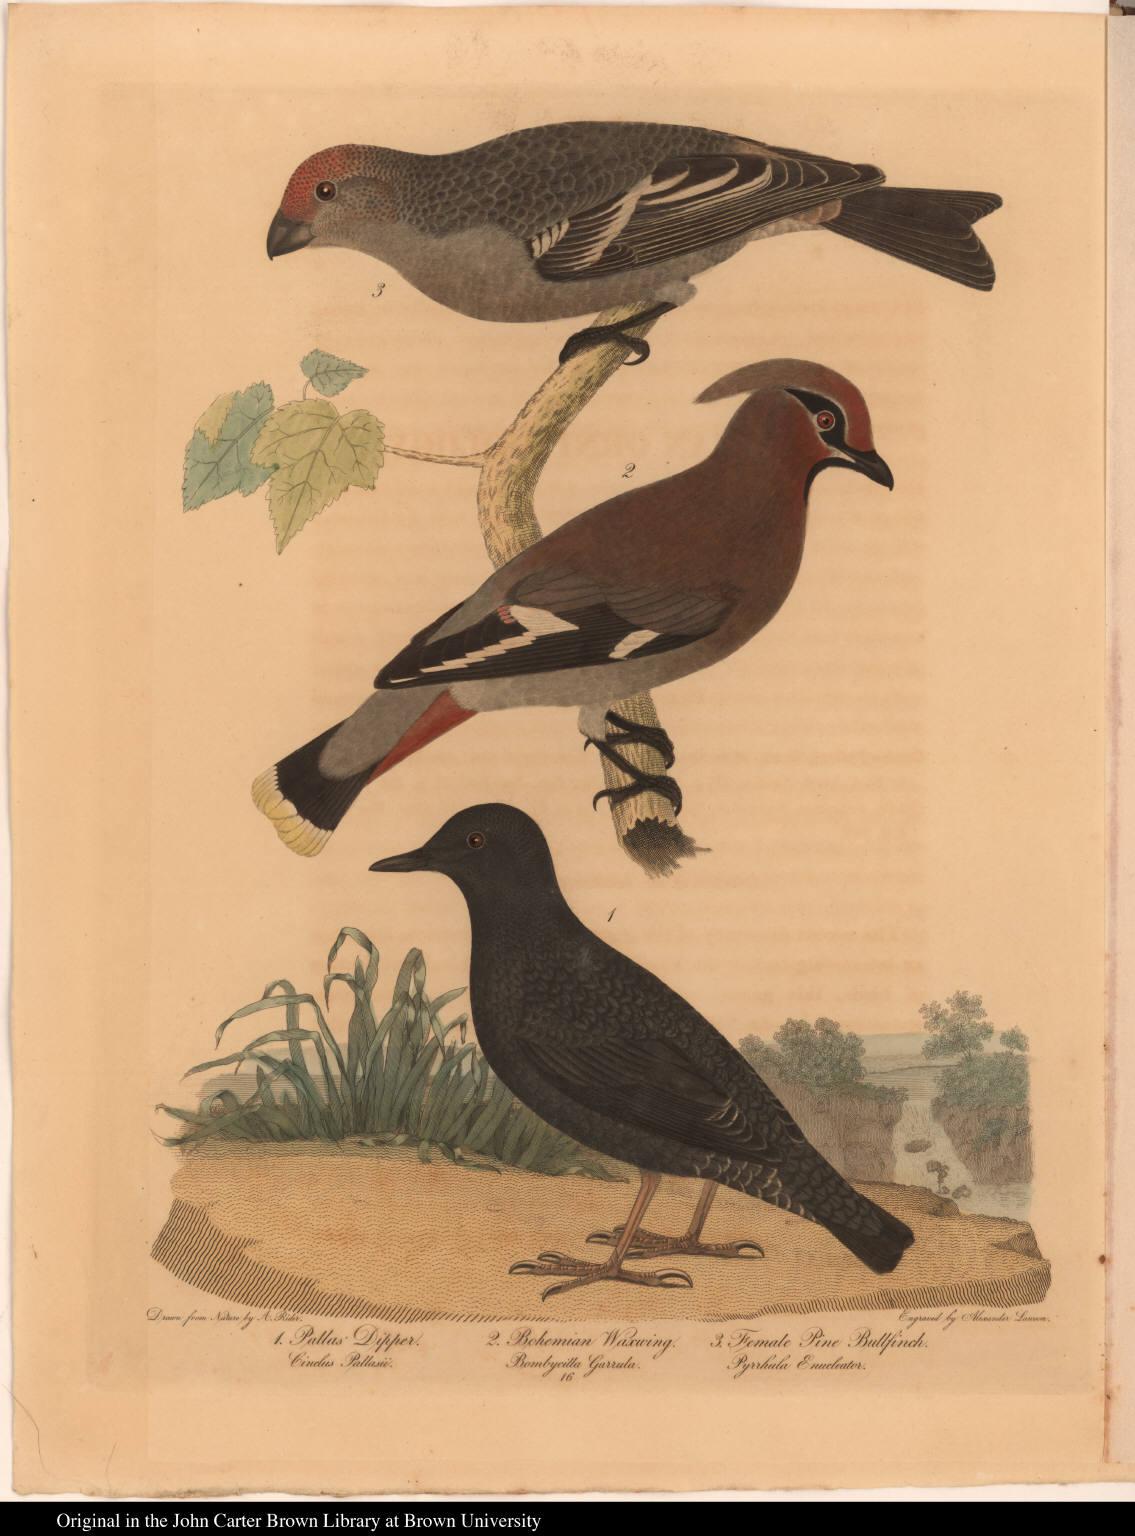 1. Pallas' Dipper. Cinclus Pallasii. 2. Bohemian Waxwing. Bombycilla Garrula. 3. Female Pine Bullfinch. Pyrrhula Enucleator.